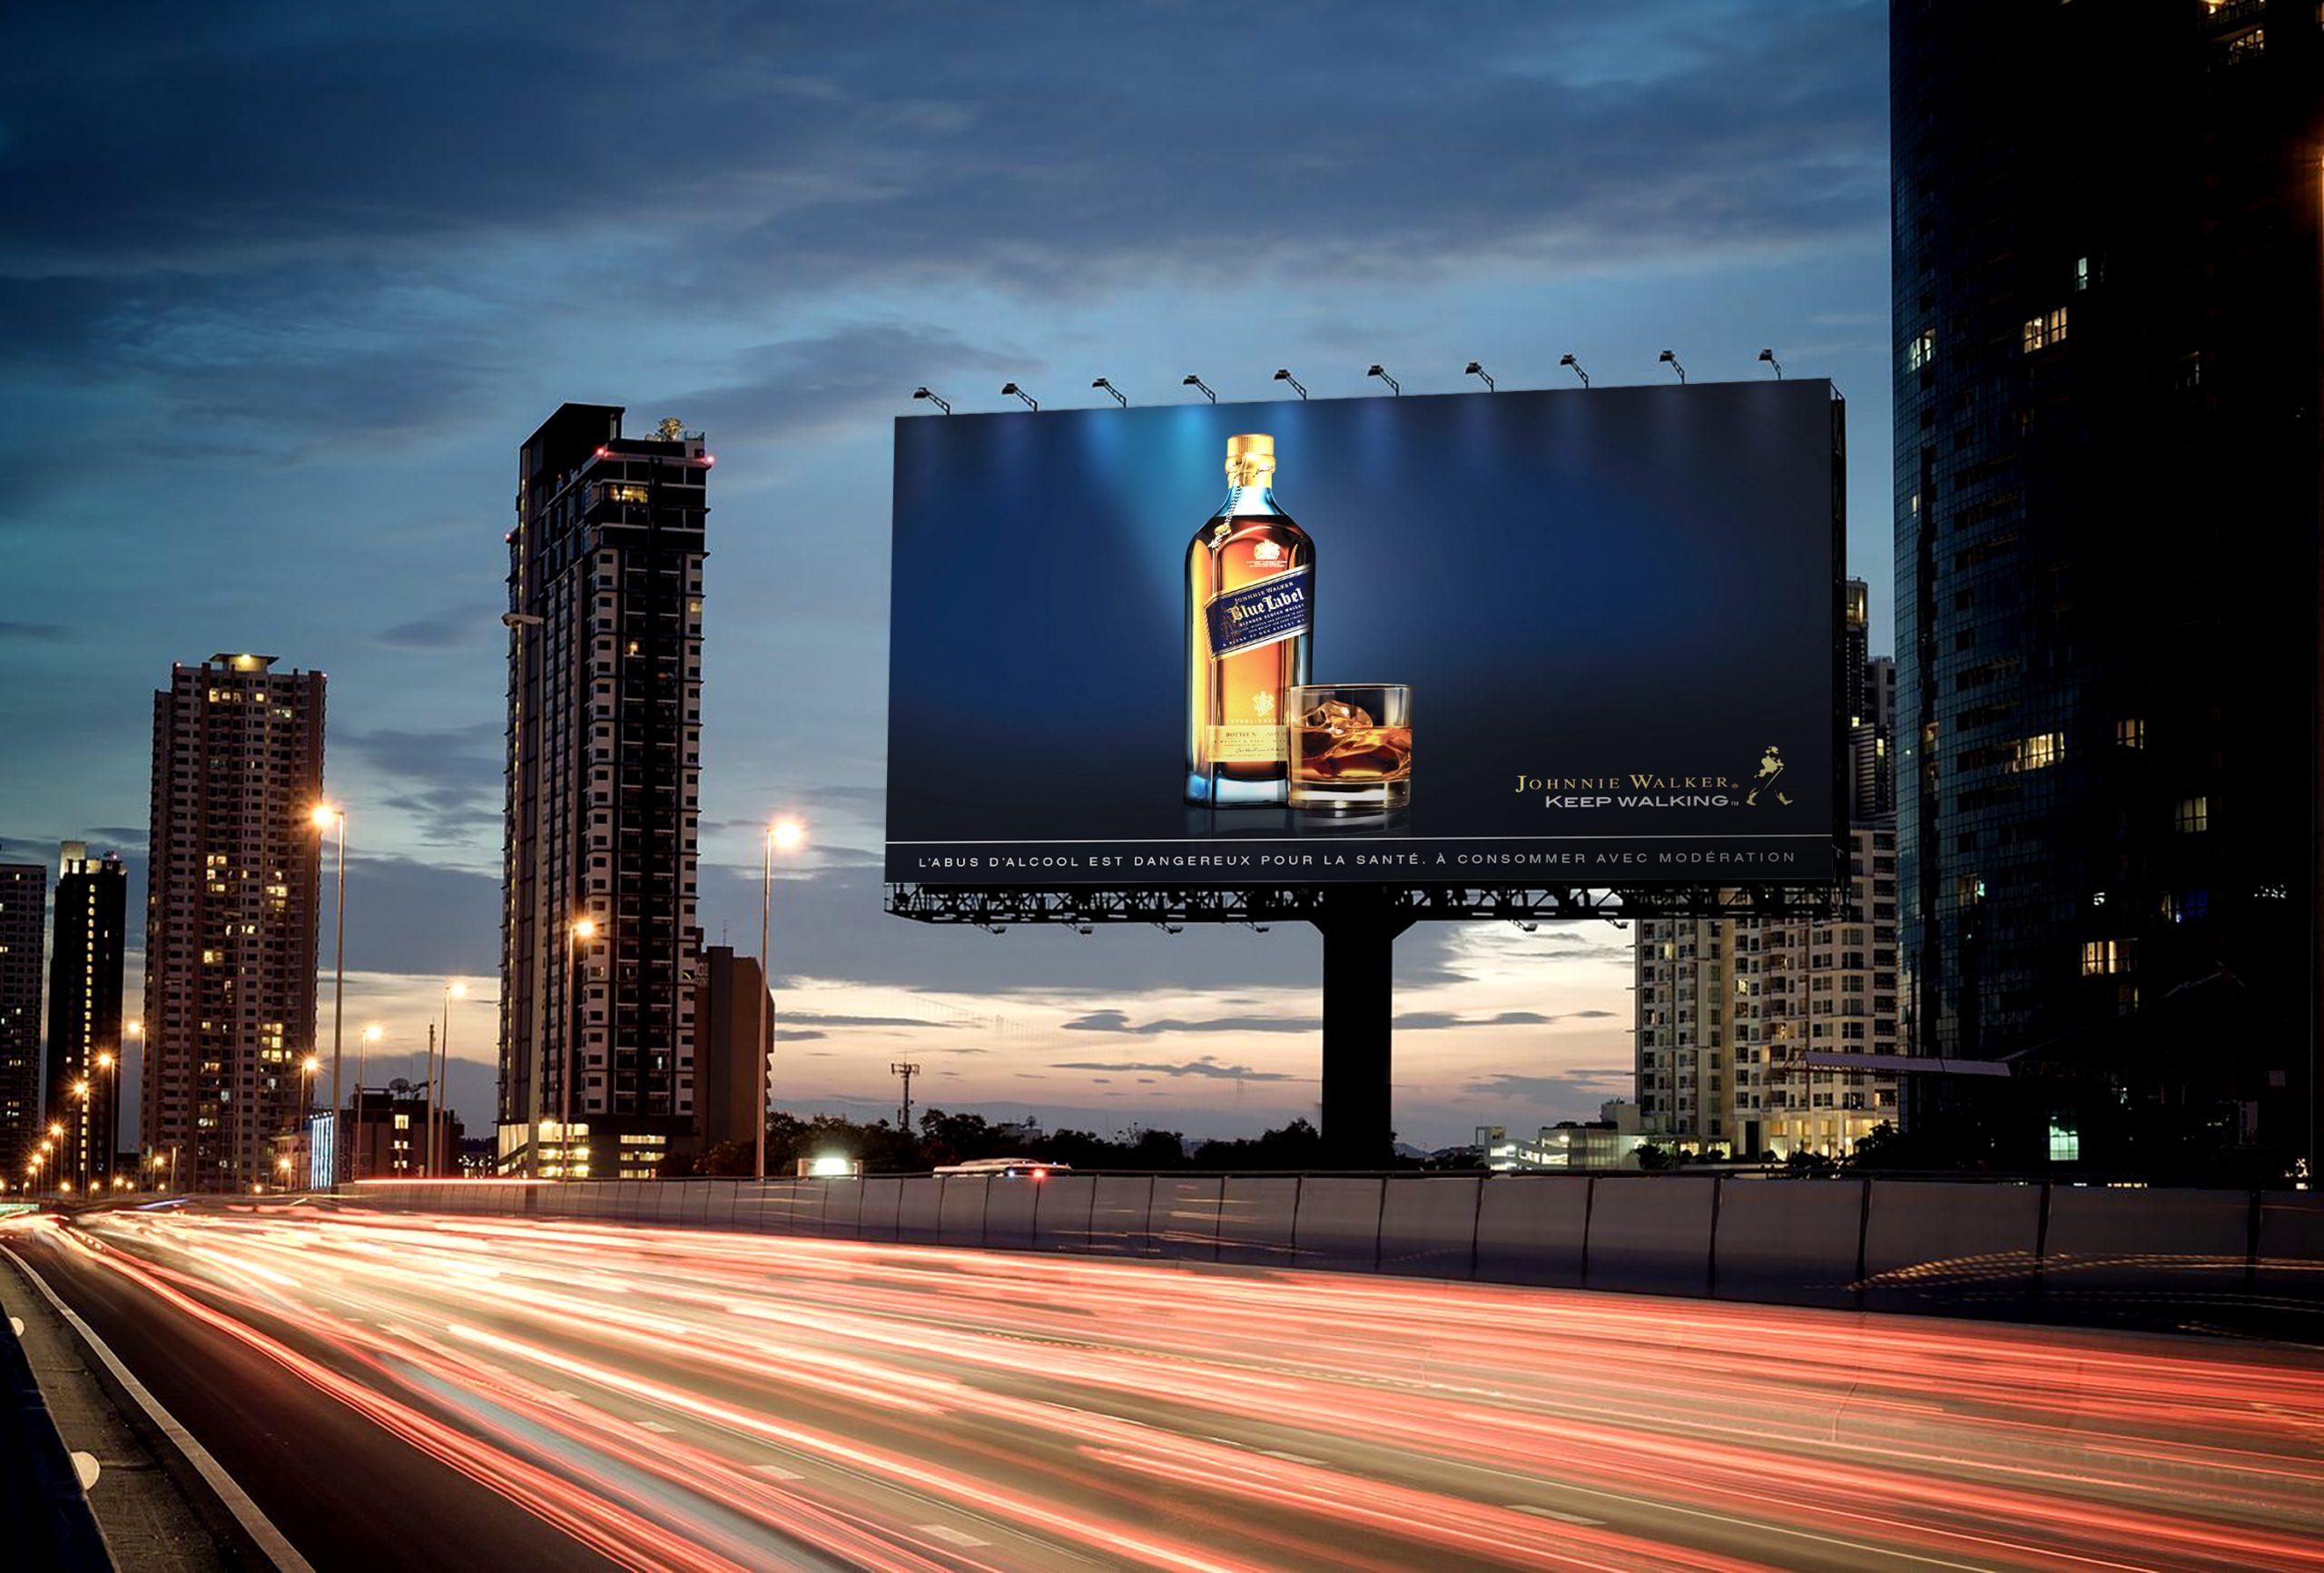 Johnnie-Walker-Publicite-Alcool-Whisky-Panneau